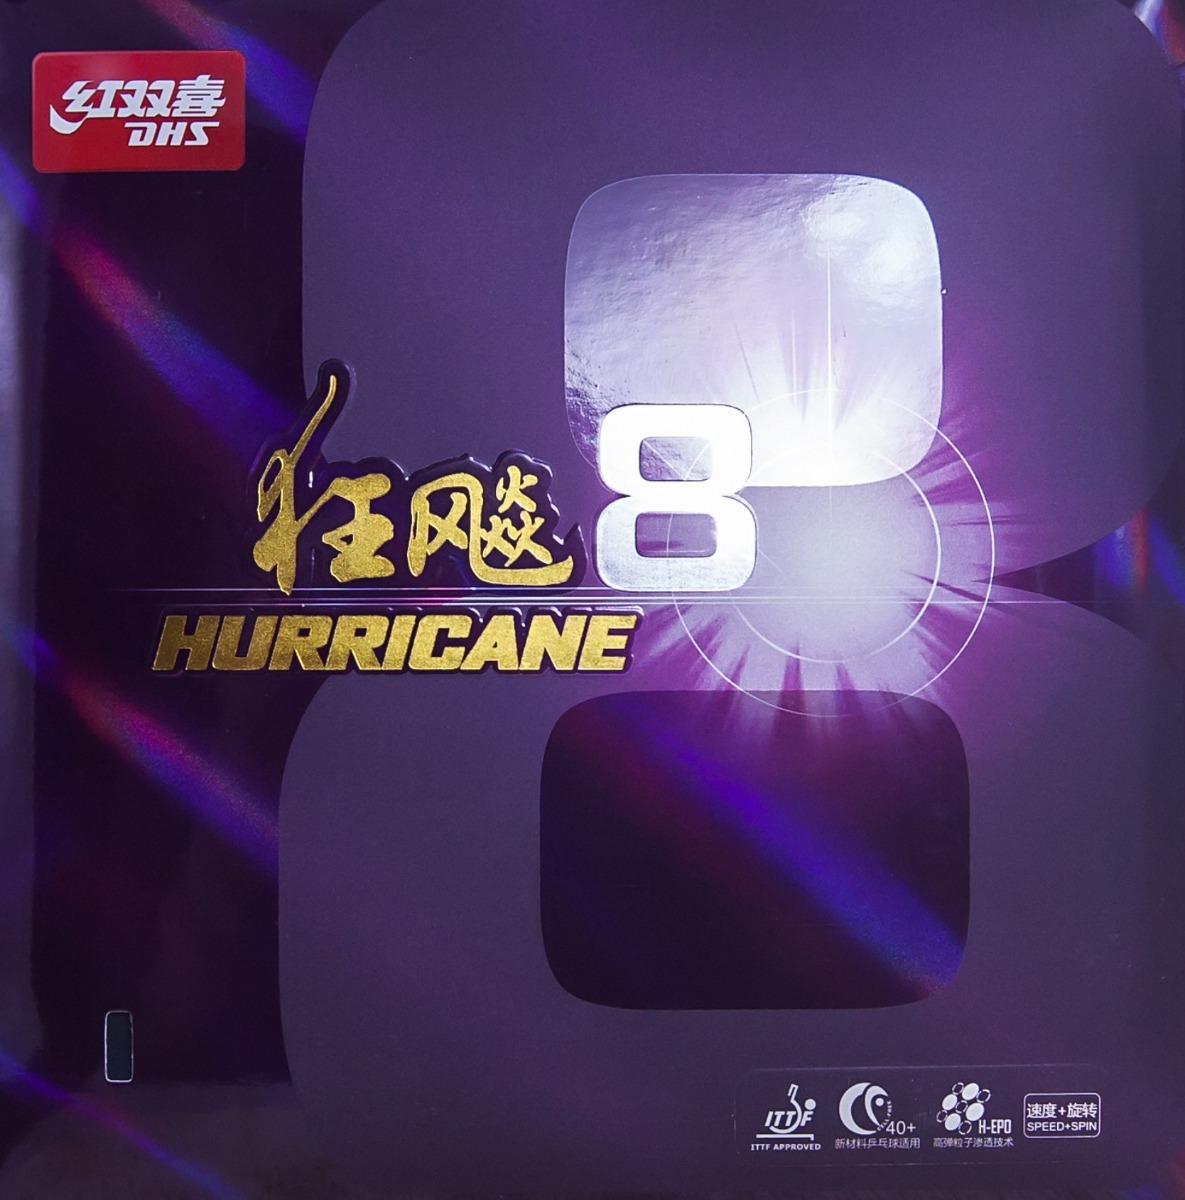 DHS Hurricane 8 Hard